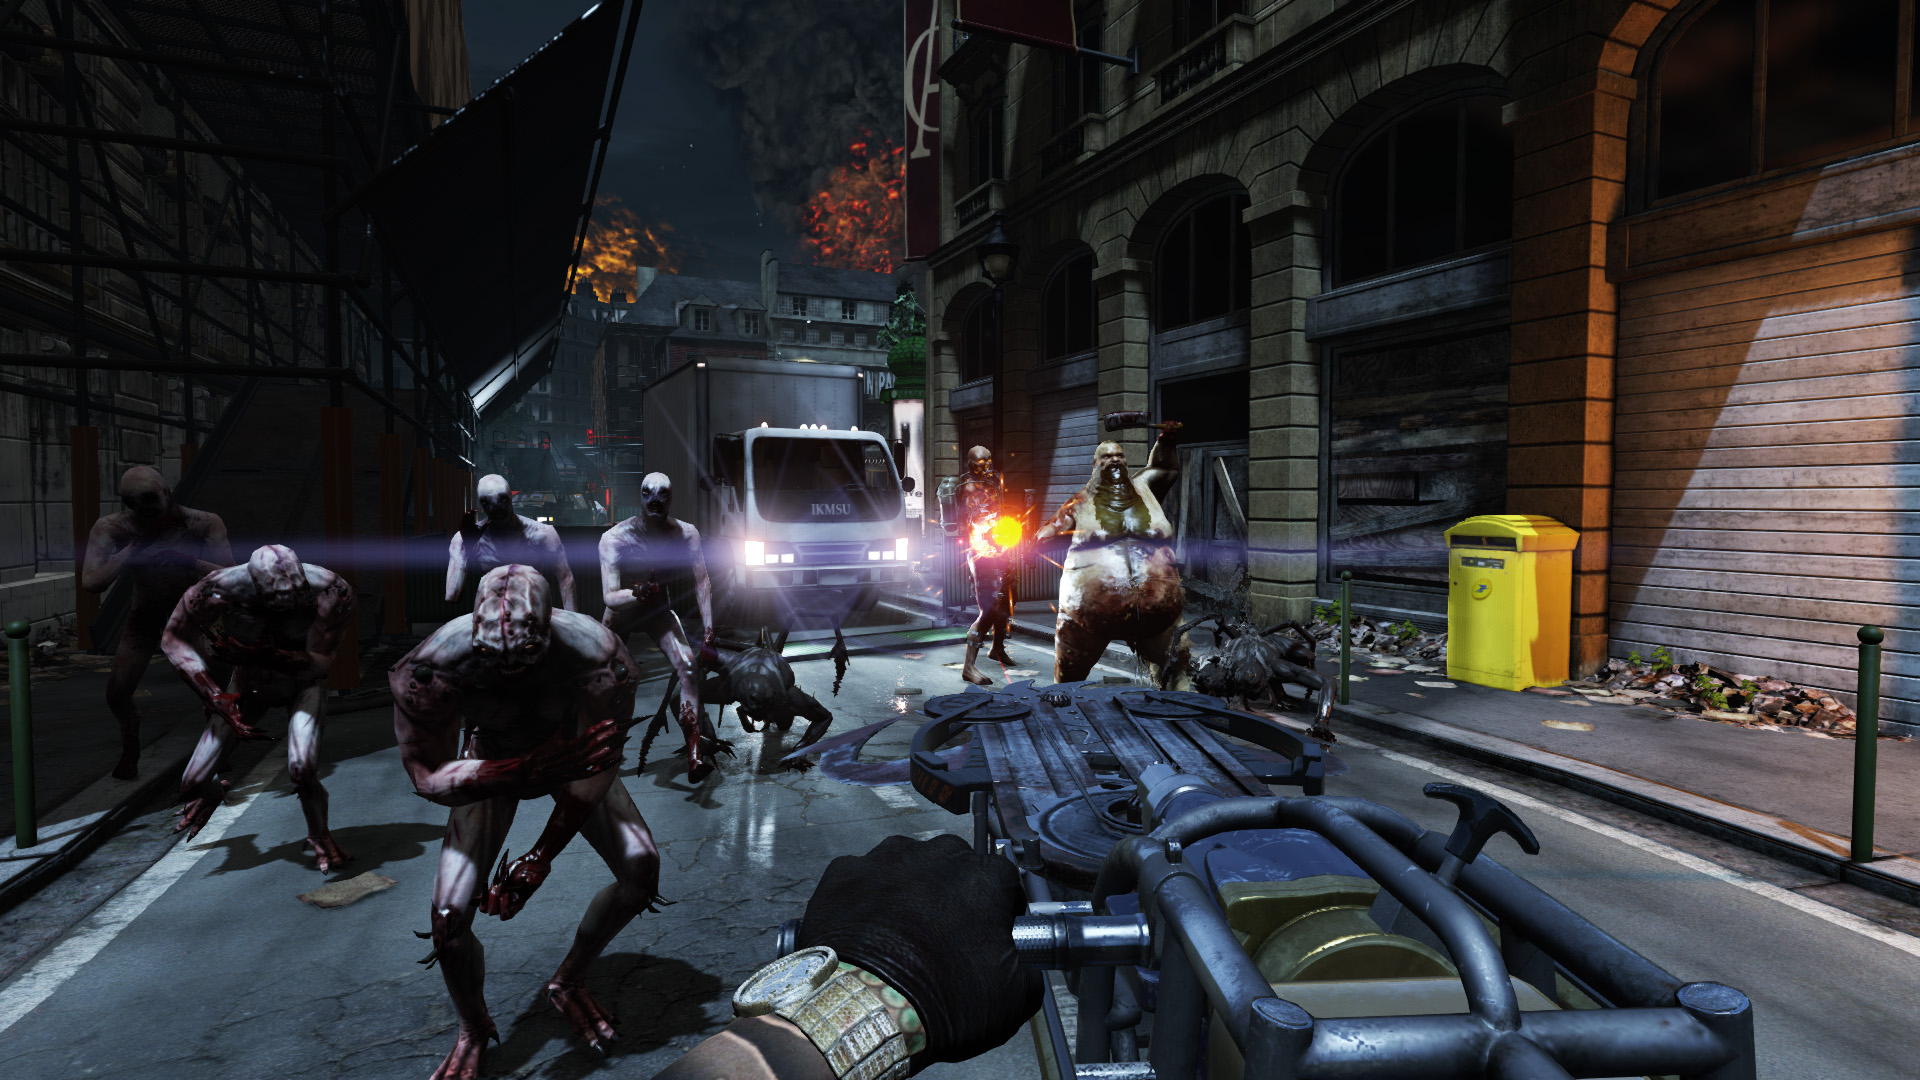 Mayhem massacre 3 - 2 part 4